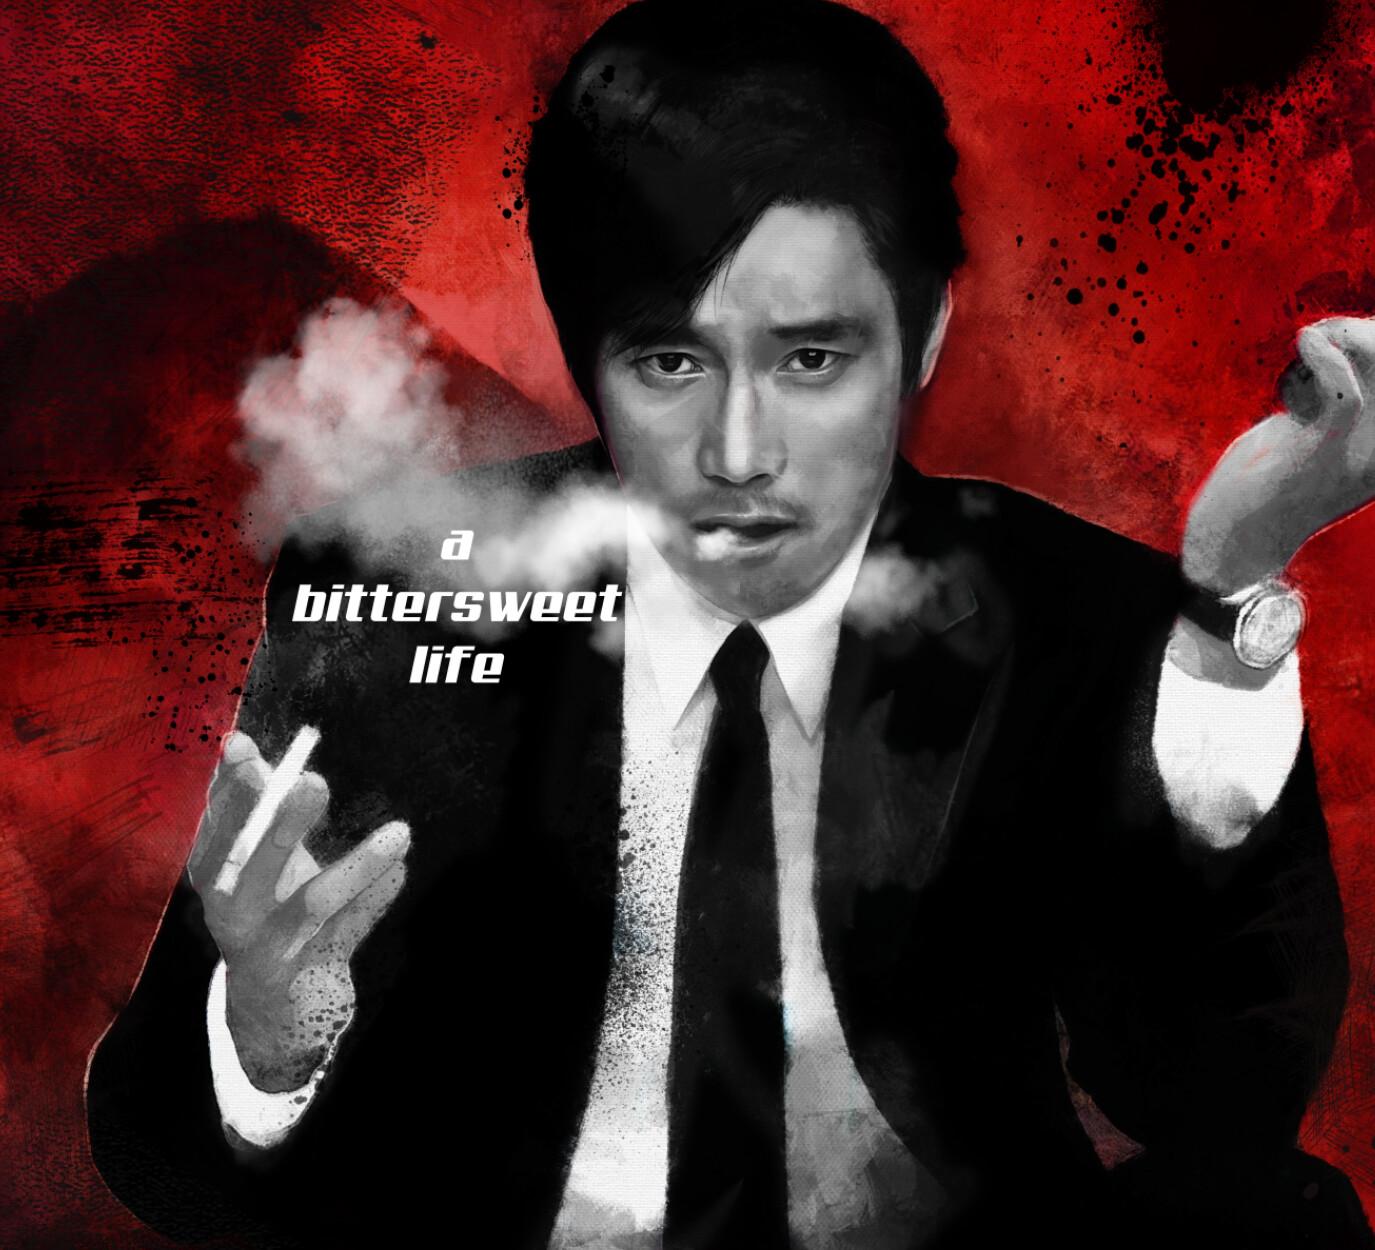 yeong-su chun - [A Bittersweet Life] 이병헌